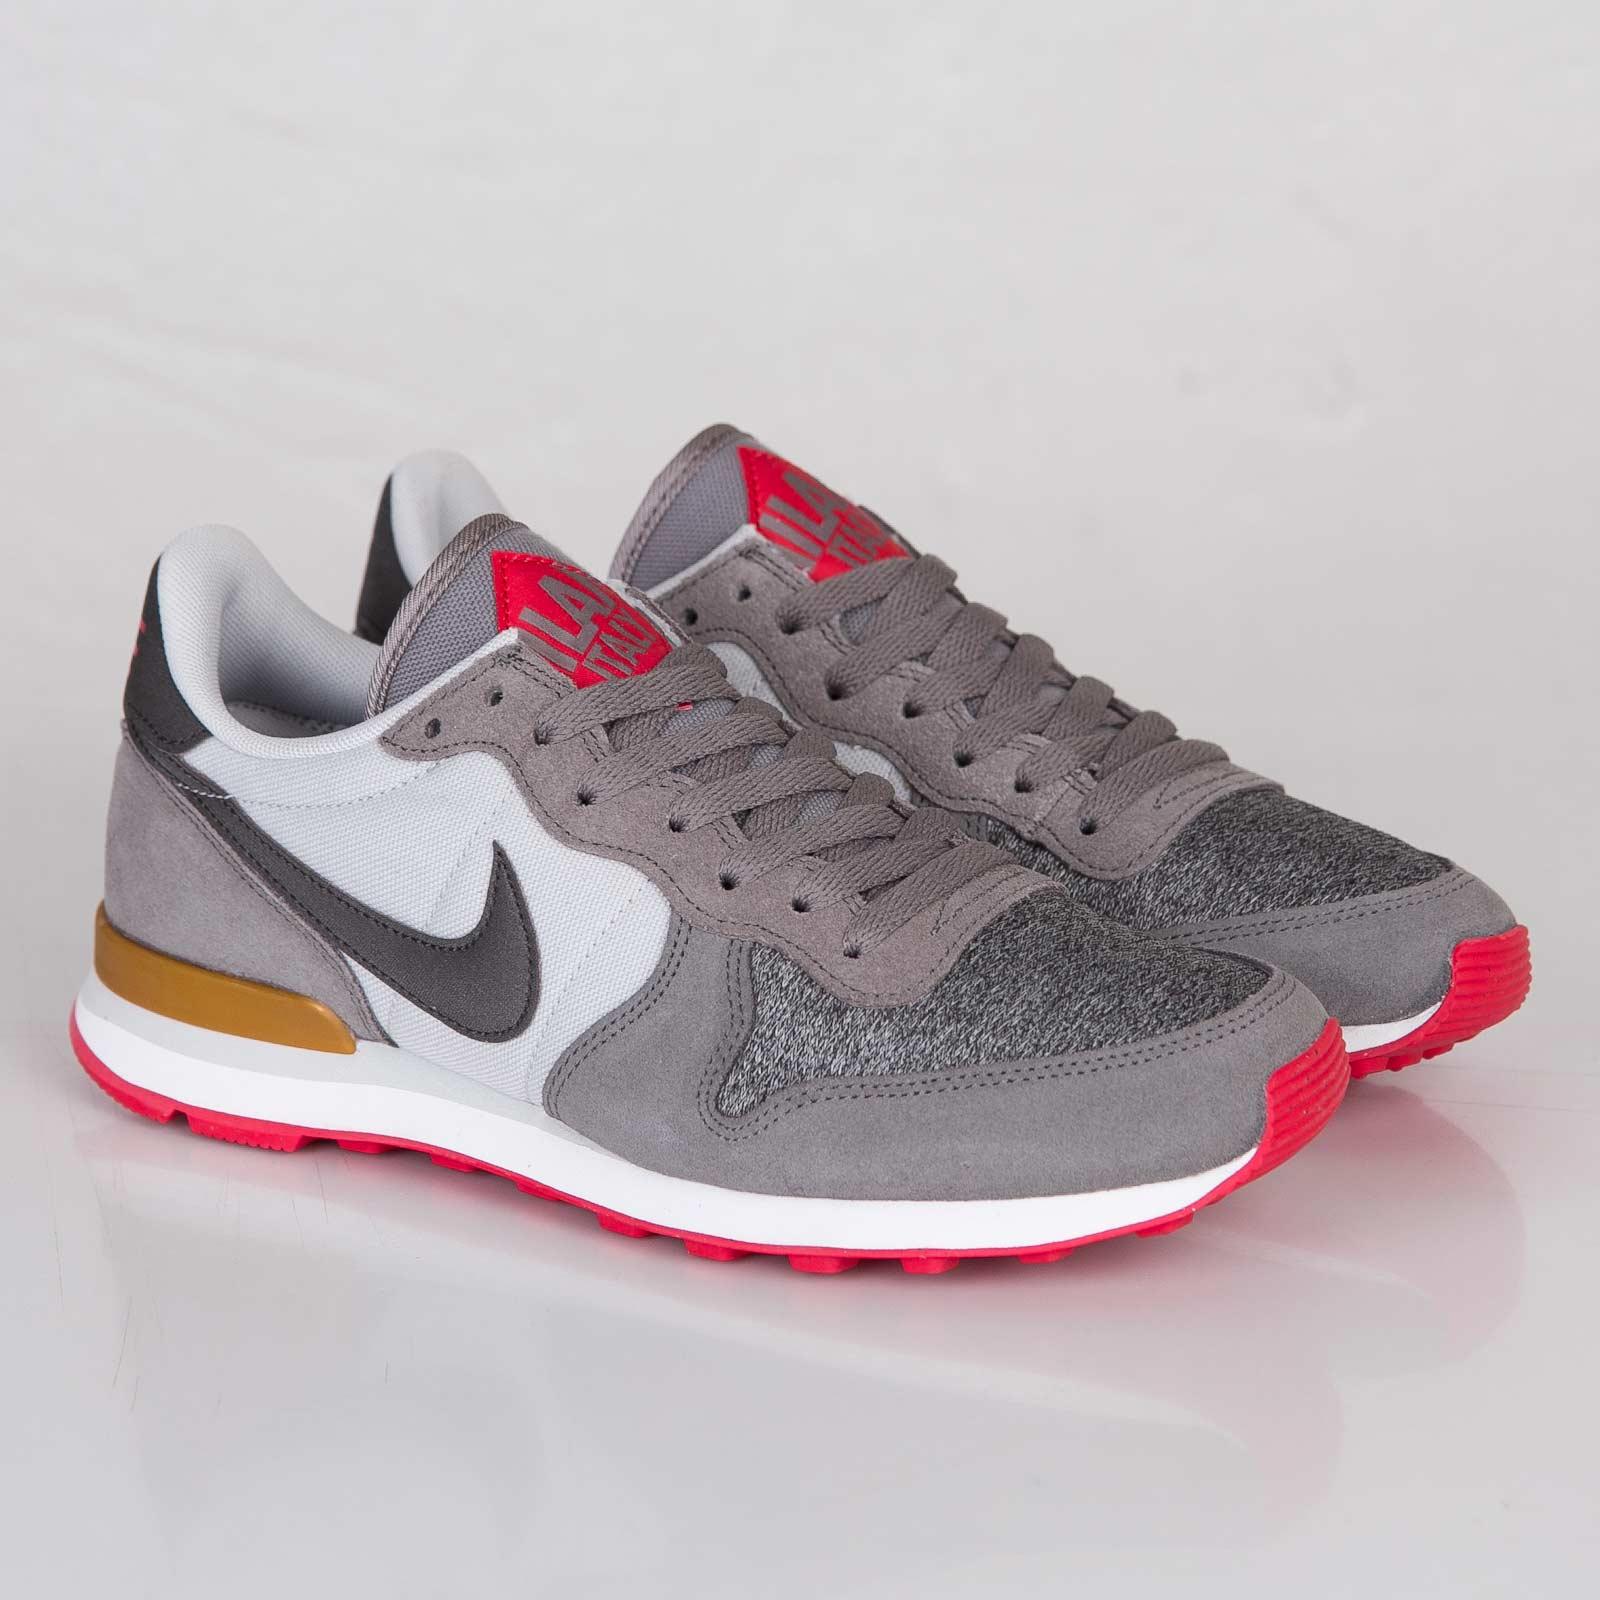 super popular 2c8e1 63d68 Nike Internationalist City QS